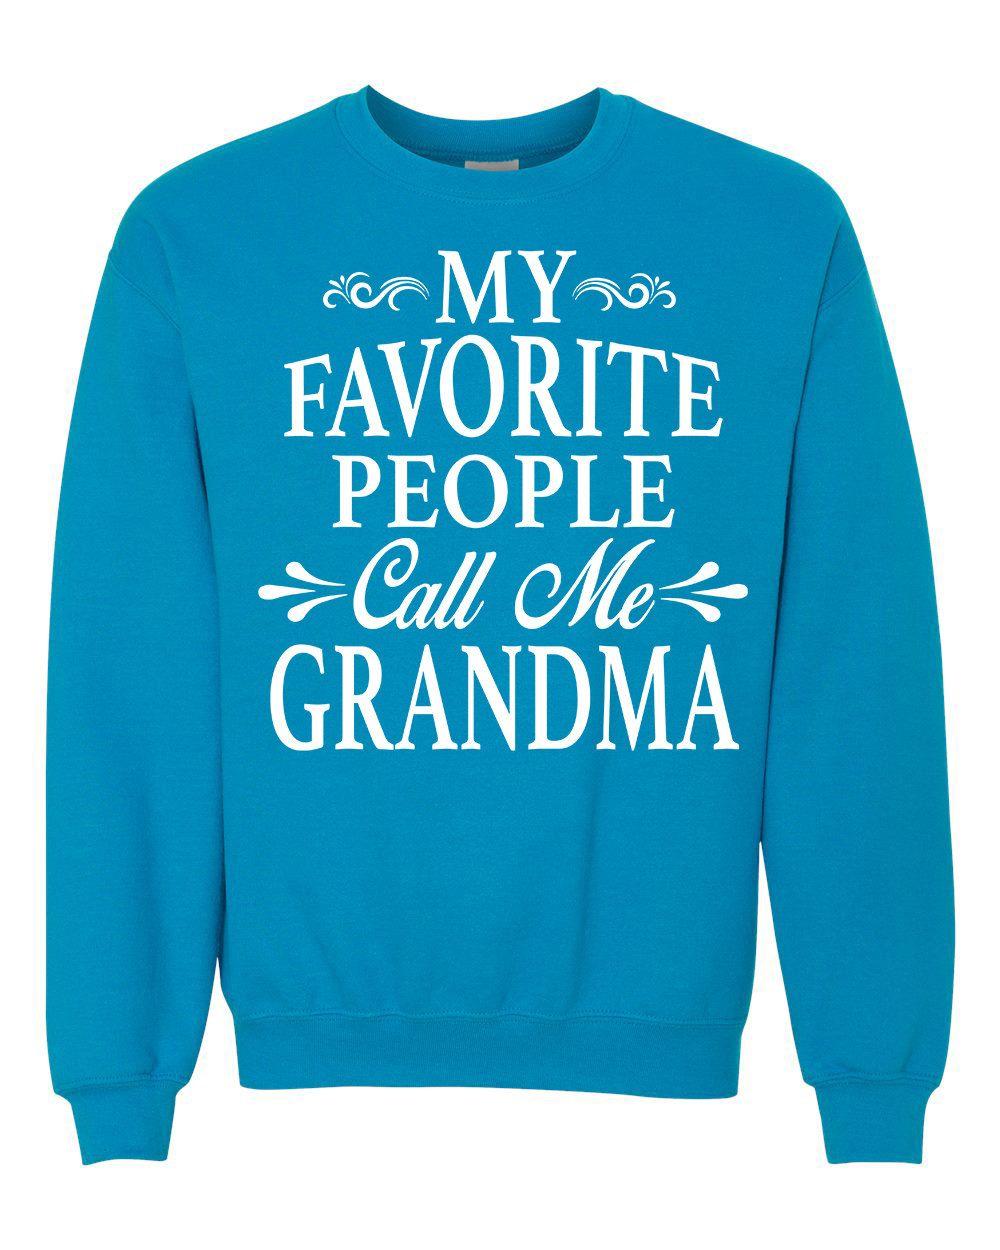 My Favorite People Call Me Nanny - Unisex Crewneck Sweatshirt - Nanny Gift DbgTSv